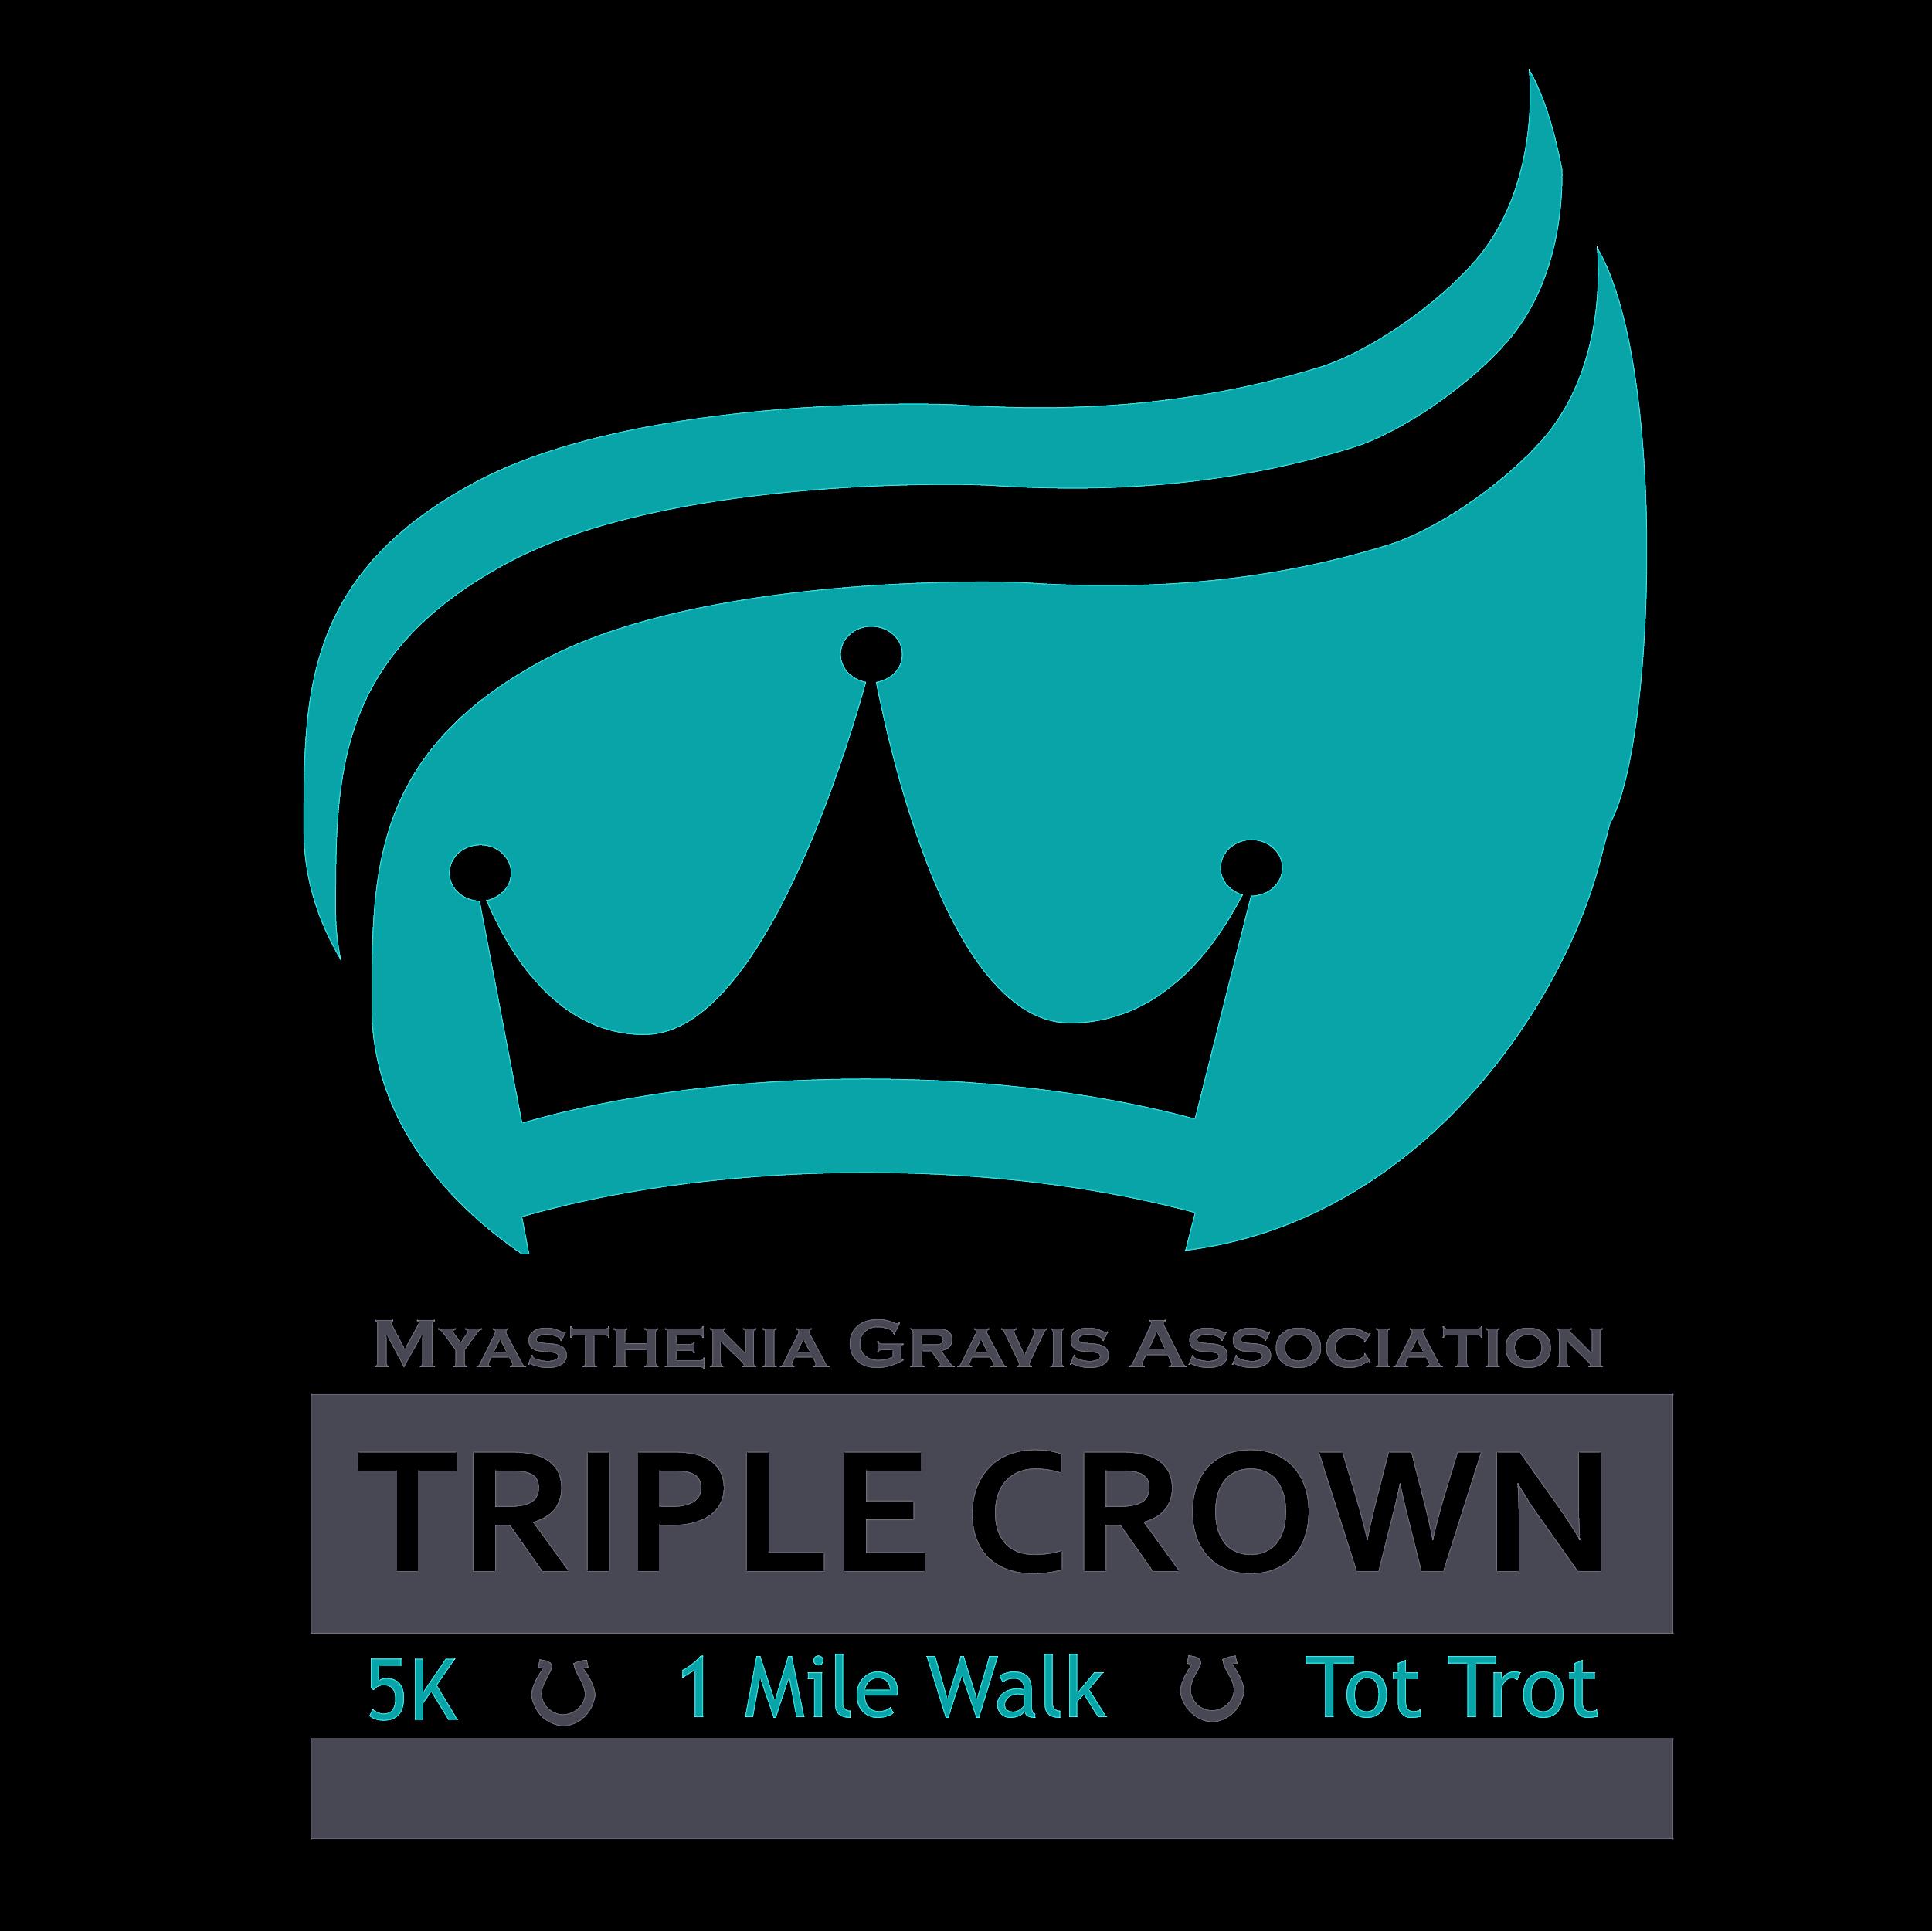 The MGA Triple Crown Showdown 5K Run/Walk, Mile Mosey and Tot Trot benefits those impacted with myasthenia gravis living in the Heartland. (MGA Triple Crown Showdown)